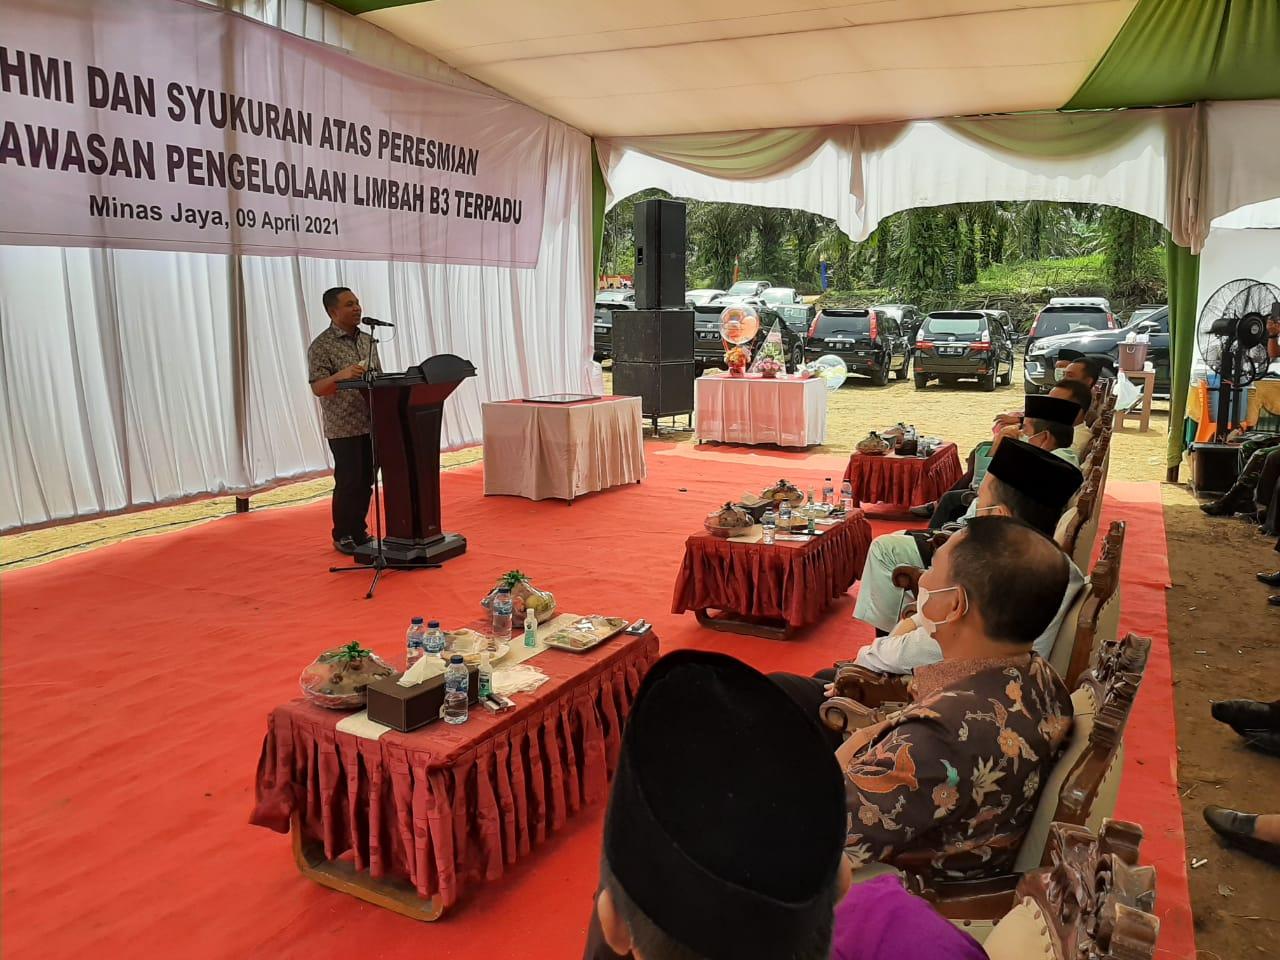 Dukung Upaya Menjaga Lingkungan, Abdul Wahid Dukung Pembangunan Pabrik Limbah Terpadu di Riau